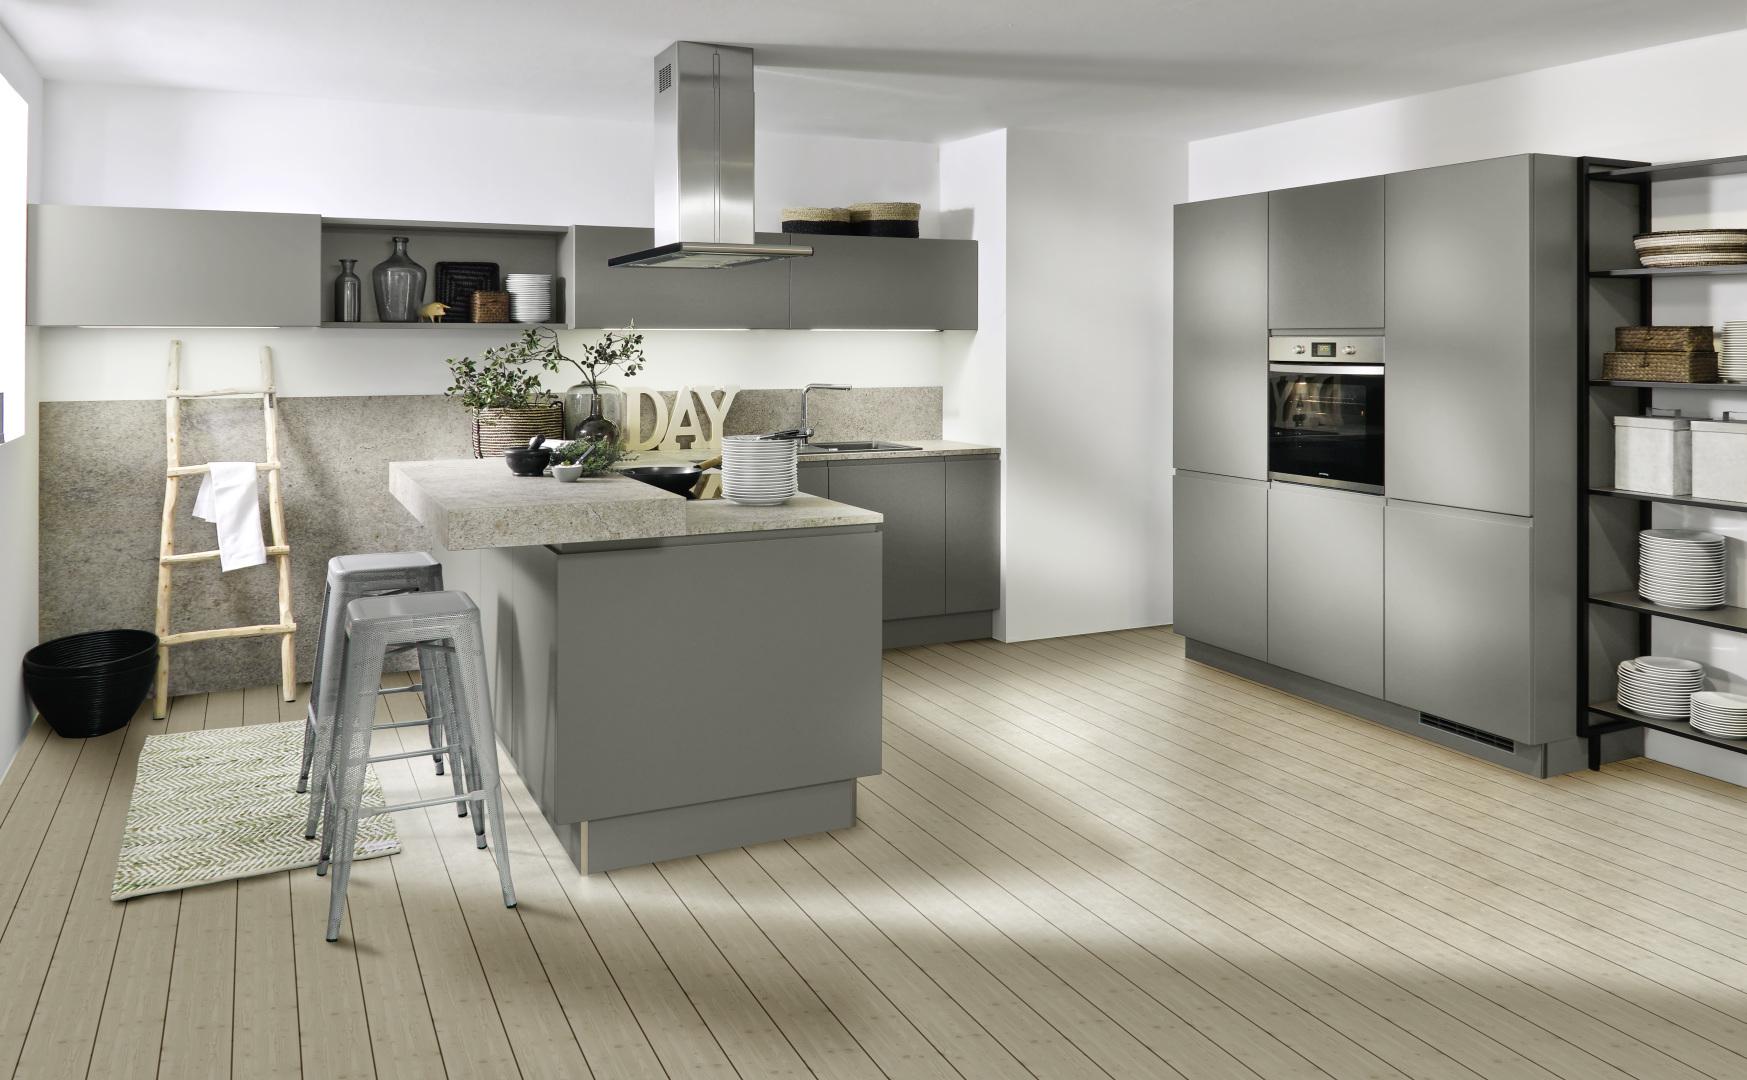 Nolte Küchen, Seattle, Quarzgrau, Softmatt, Granit, Modern, Design